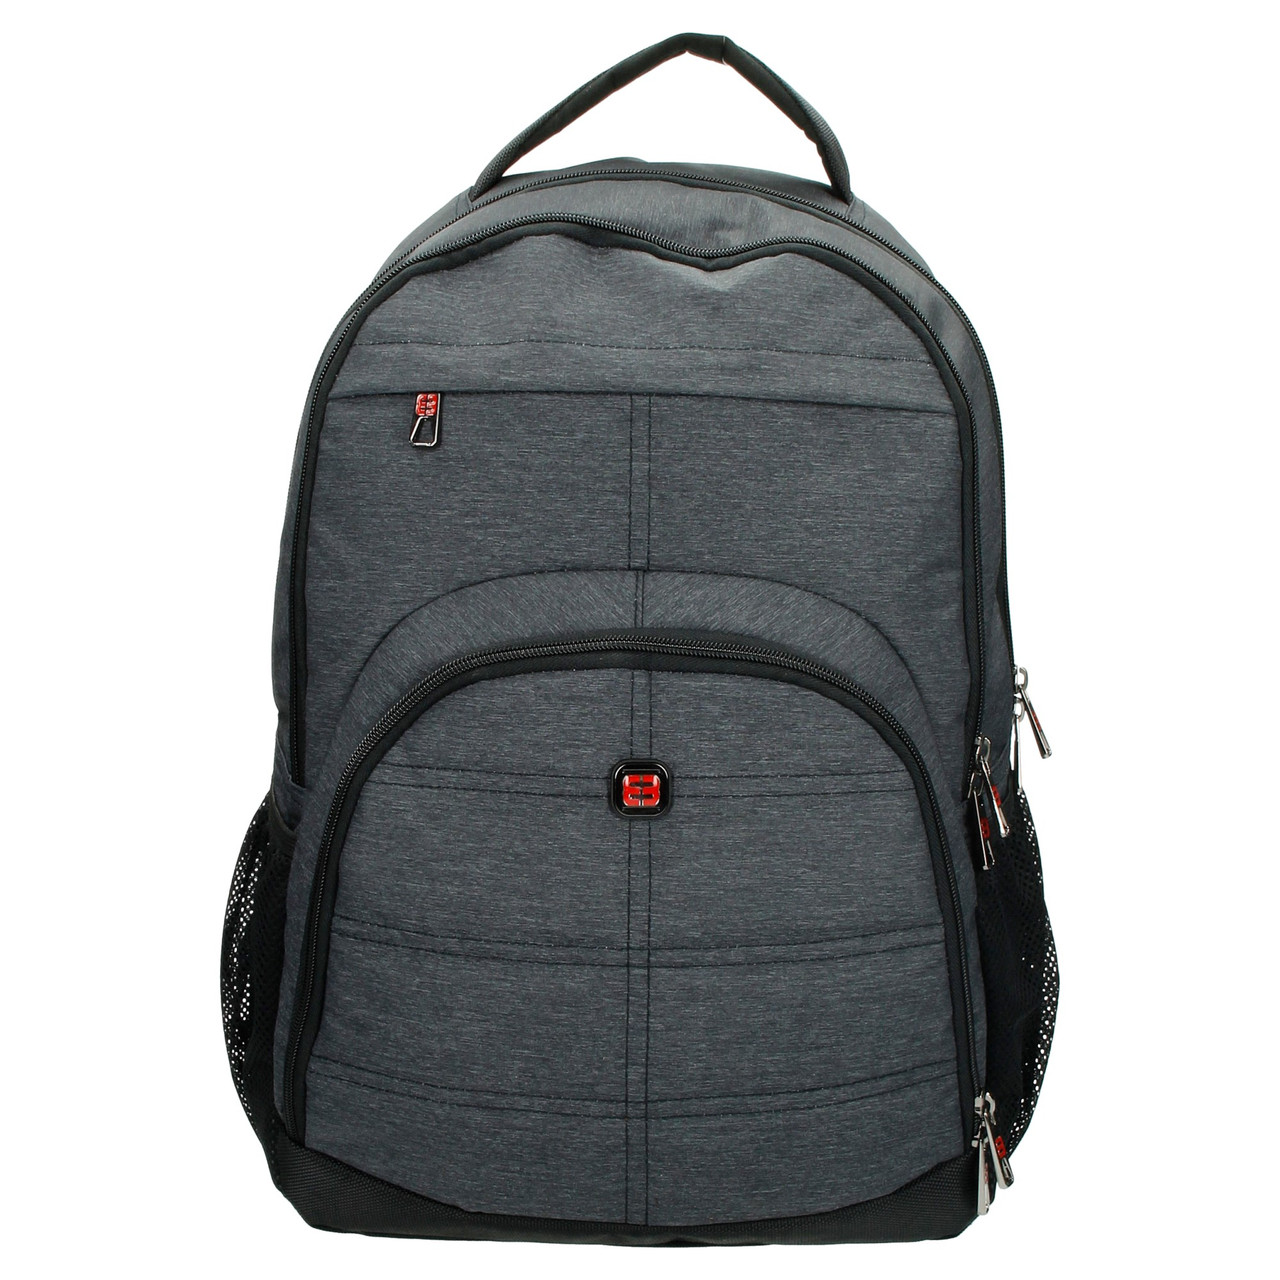 Enrico benetti рюкзак купить в украине tinkerbell рюкзак сумка